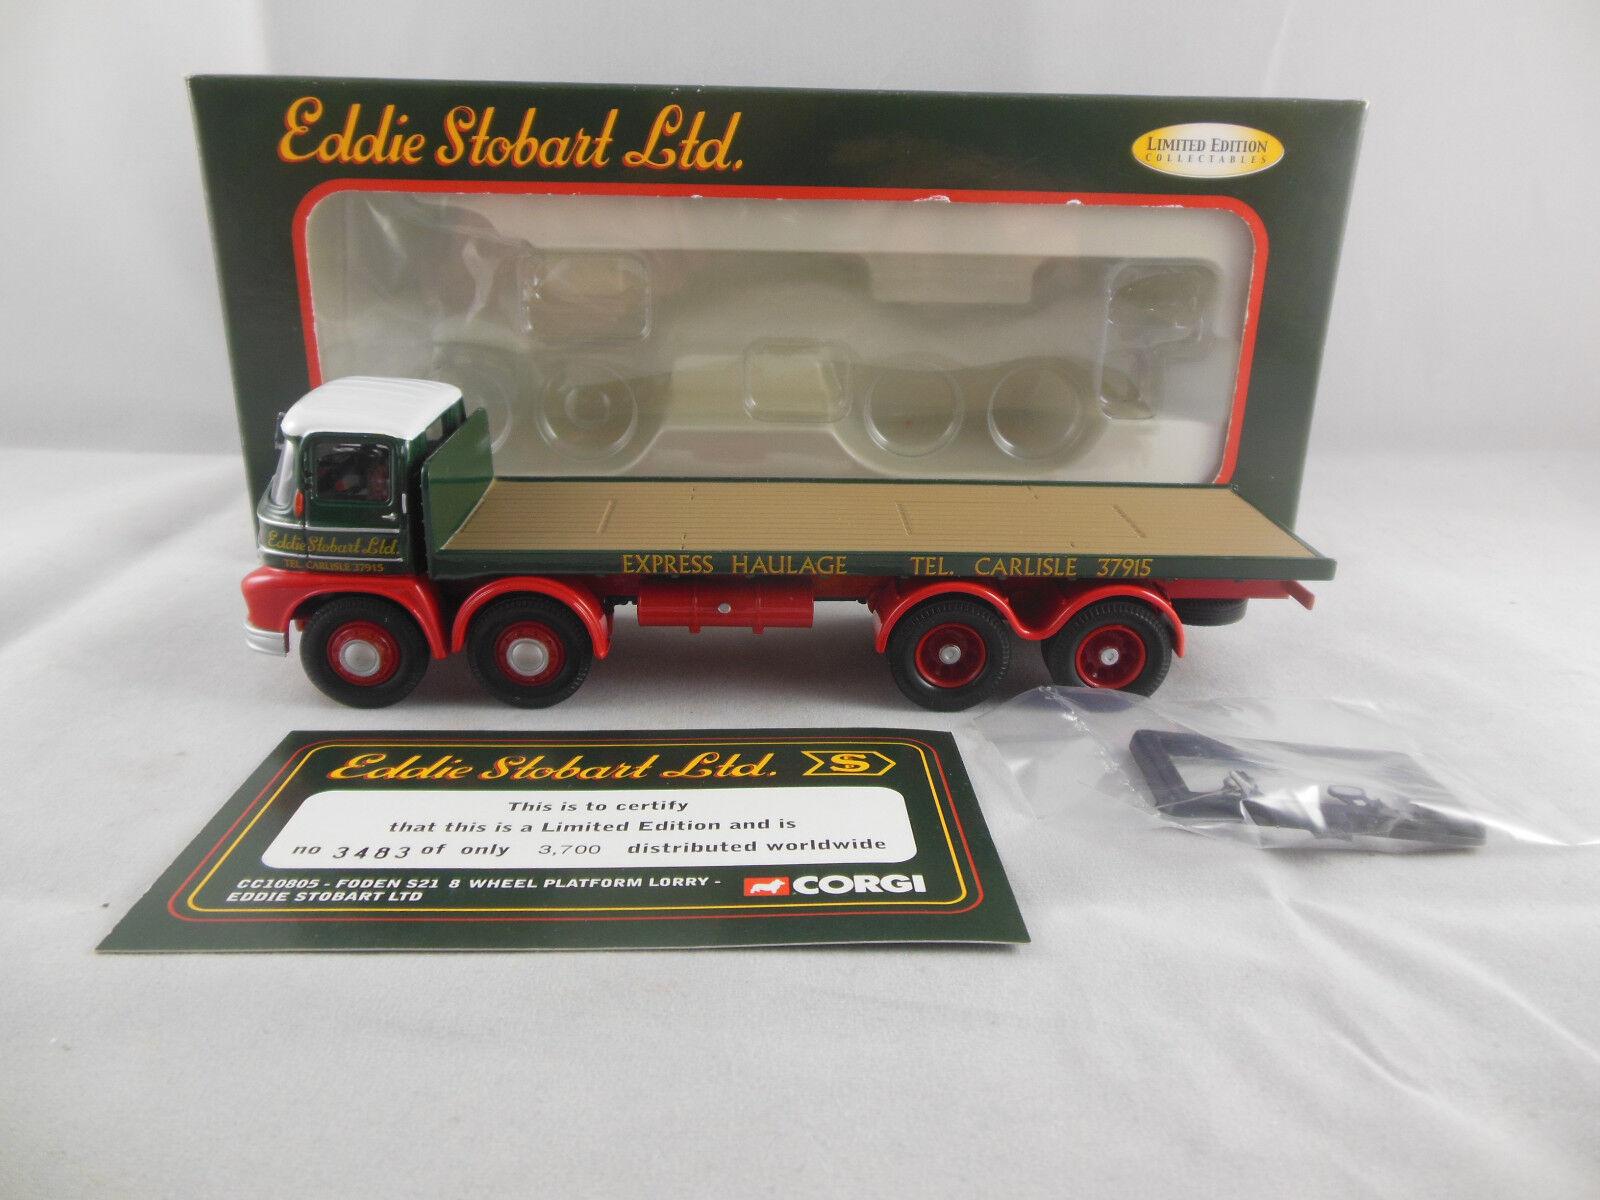 Corgi Classics CC10805 Foden S21 8 Wheel Platform Lorry Eddie Stobart Ltd 1 50